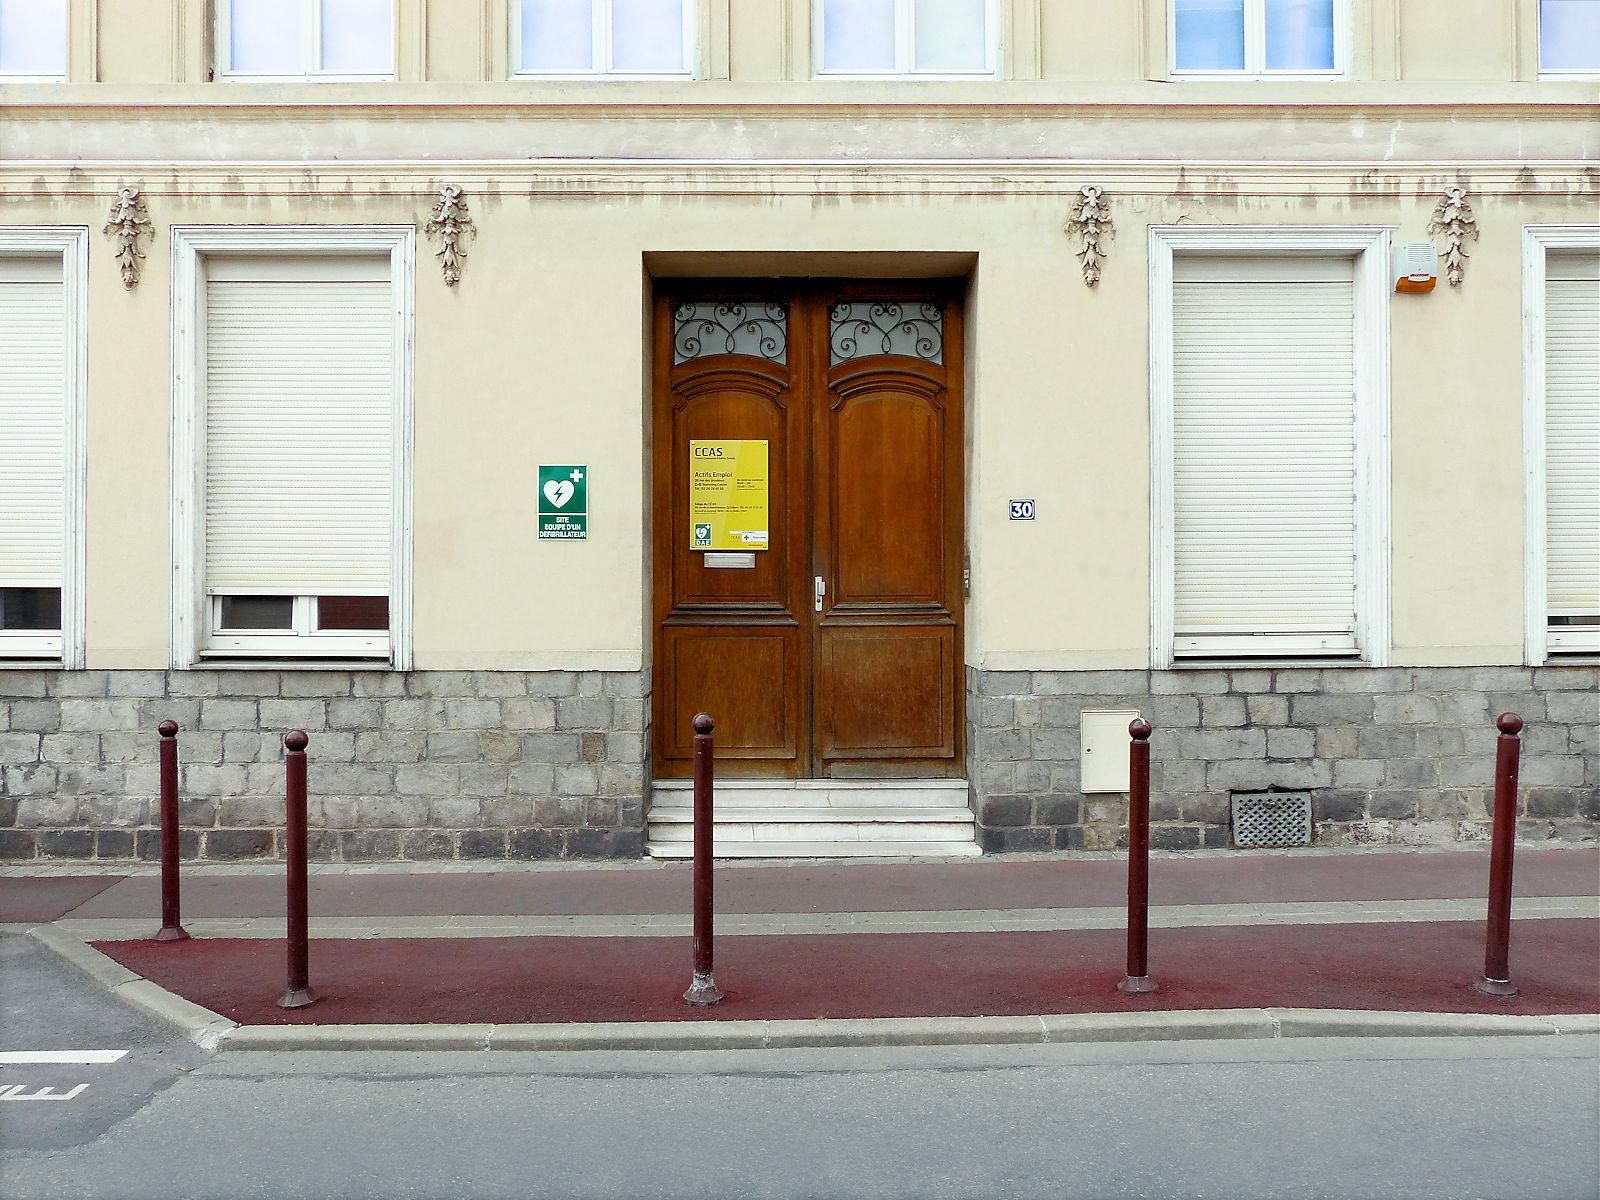 Service Actifs Emploi du CCAS de Tourcoing